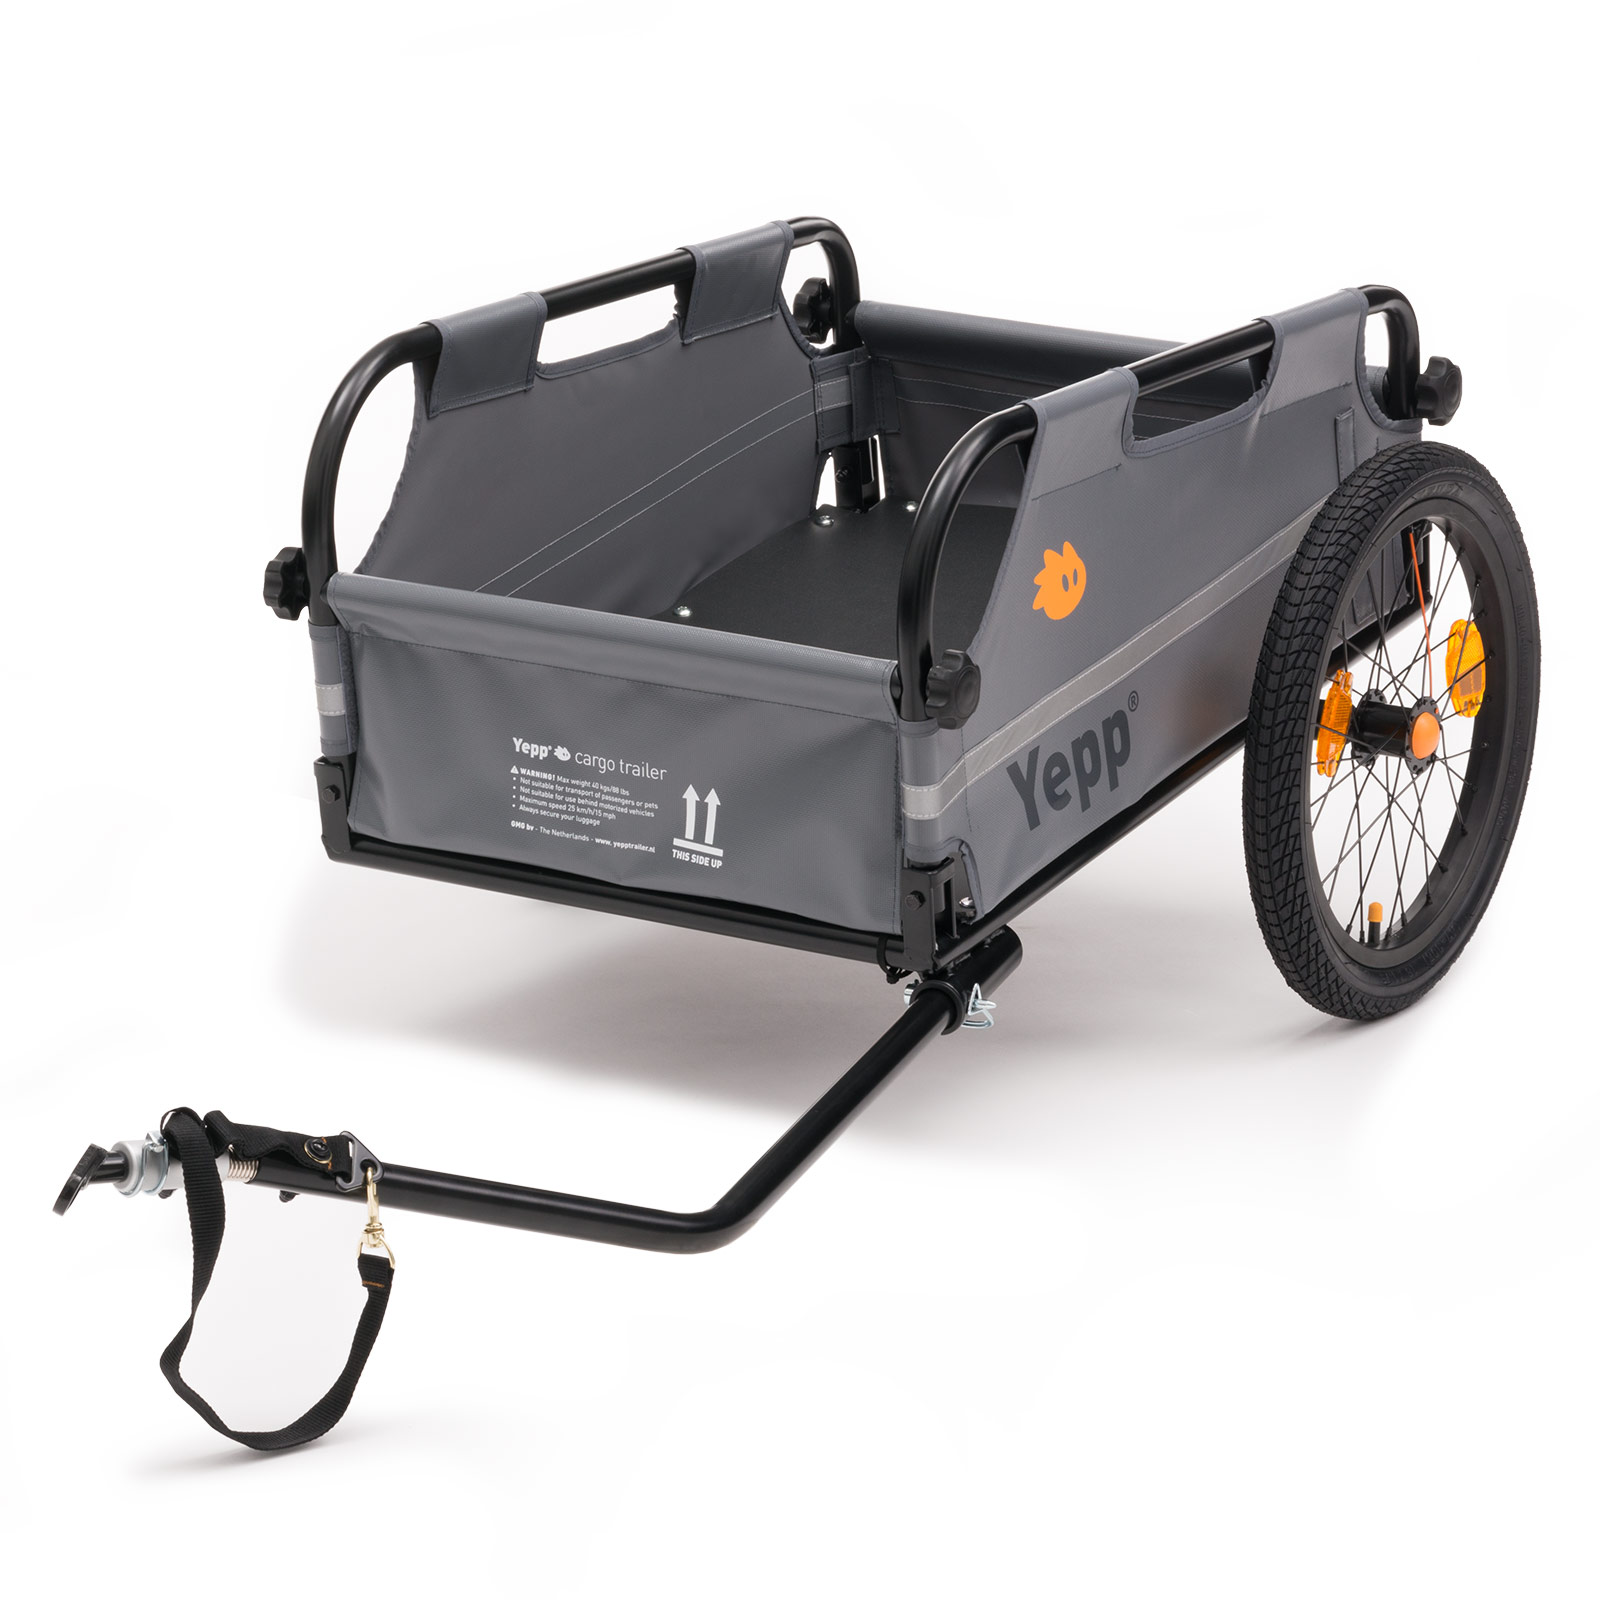 fahrrad lastenanh nger yepp cargo fahrradtransportanh nger. Black Bedroom Furniture Sets. Home Design Ideas